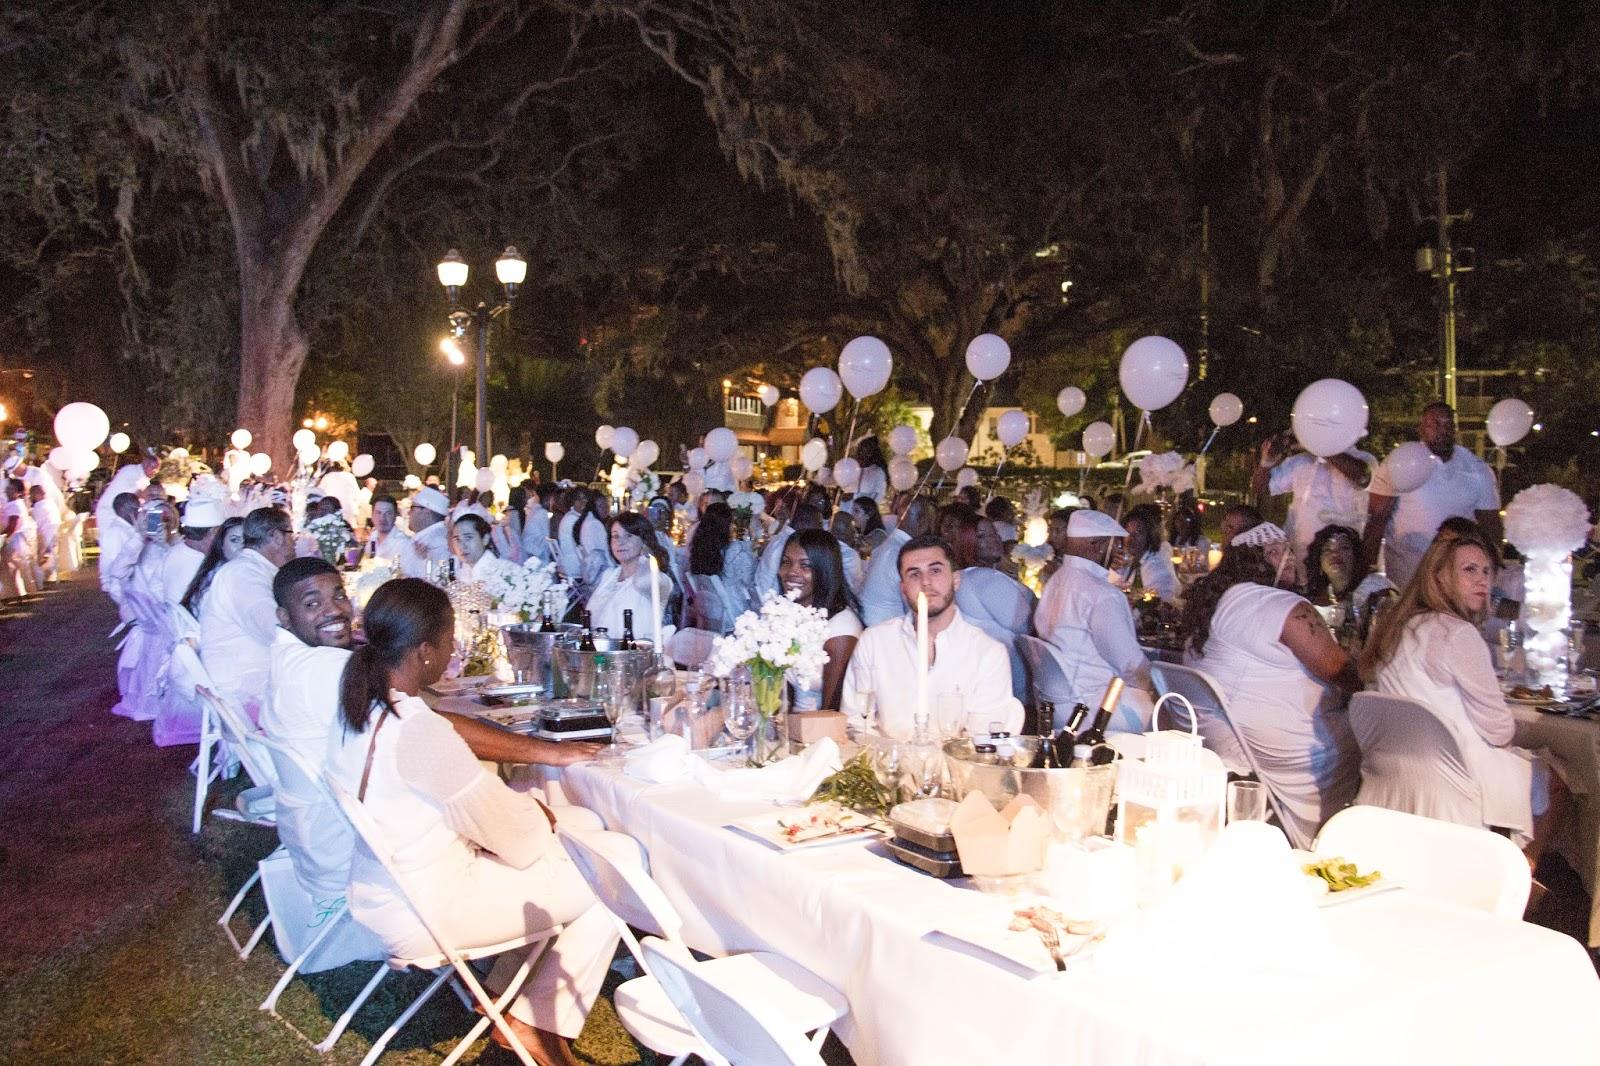 Diner En Blanc – A Sea of White Wonder